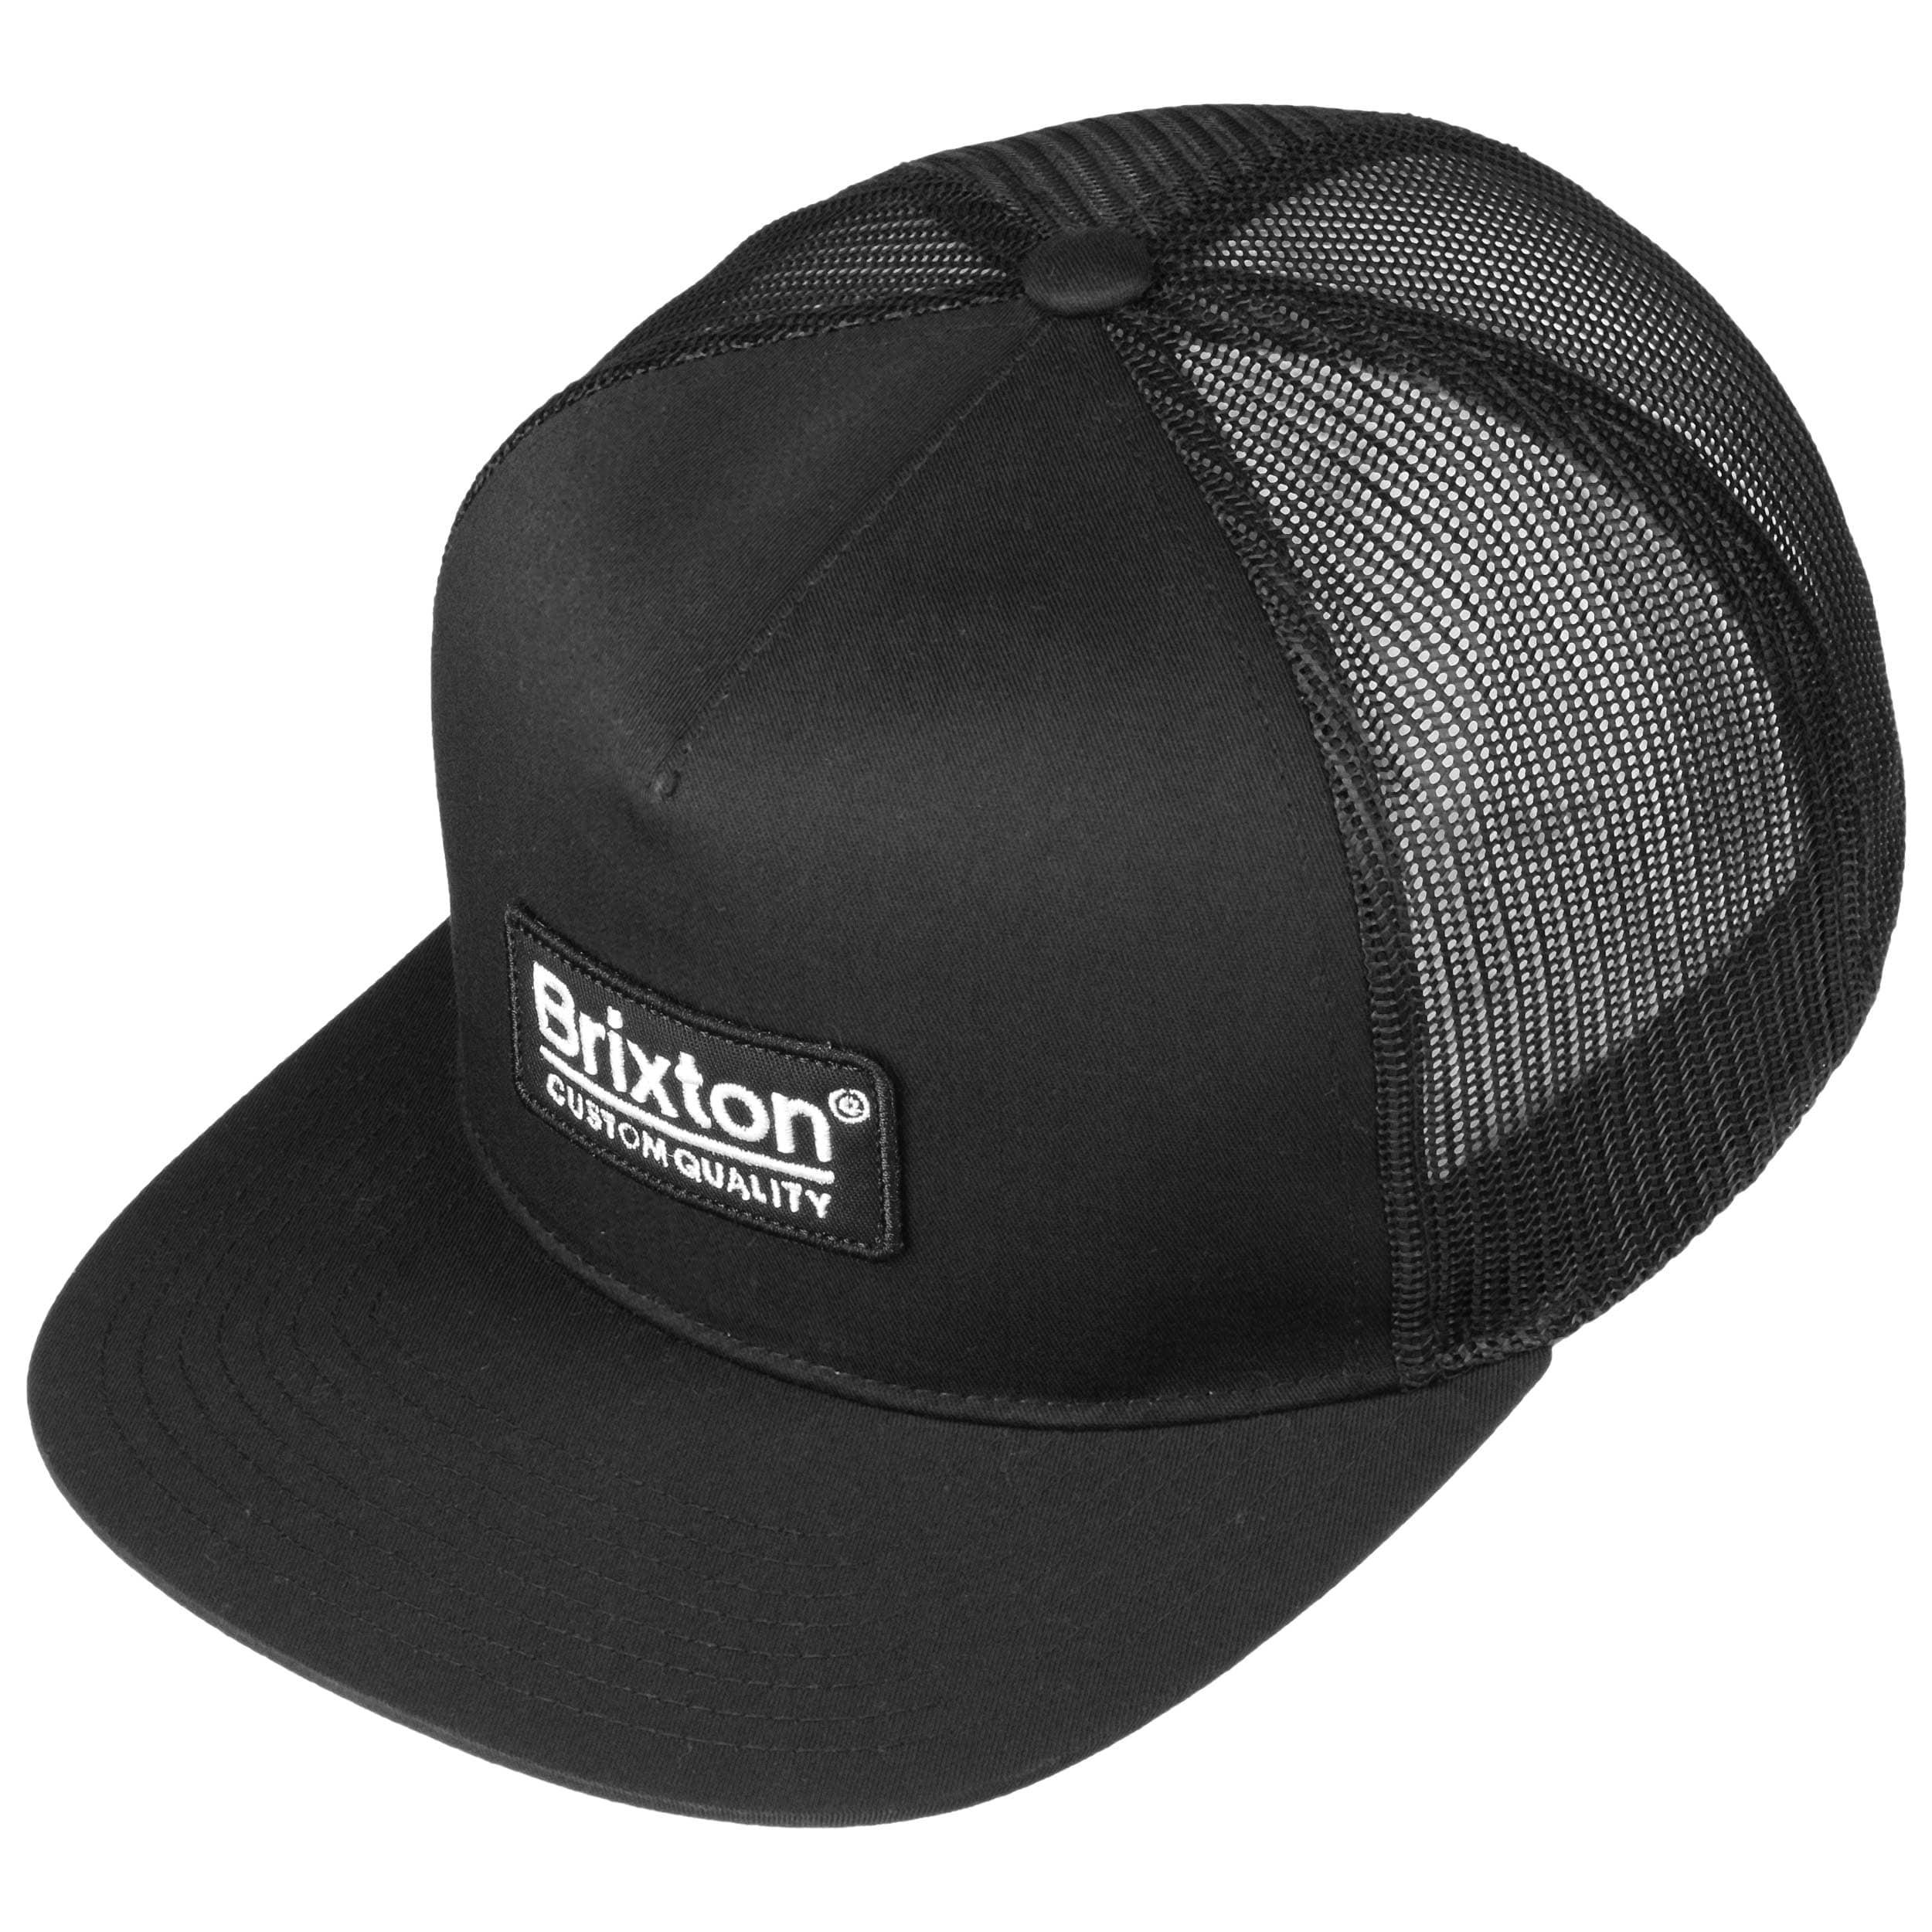 9bae9d101c8 ... Palmer Mesh Cap by Brixton - black-black 1 ...